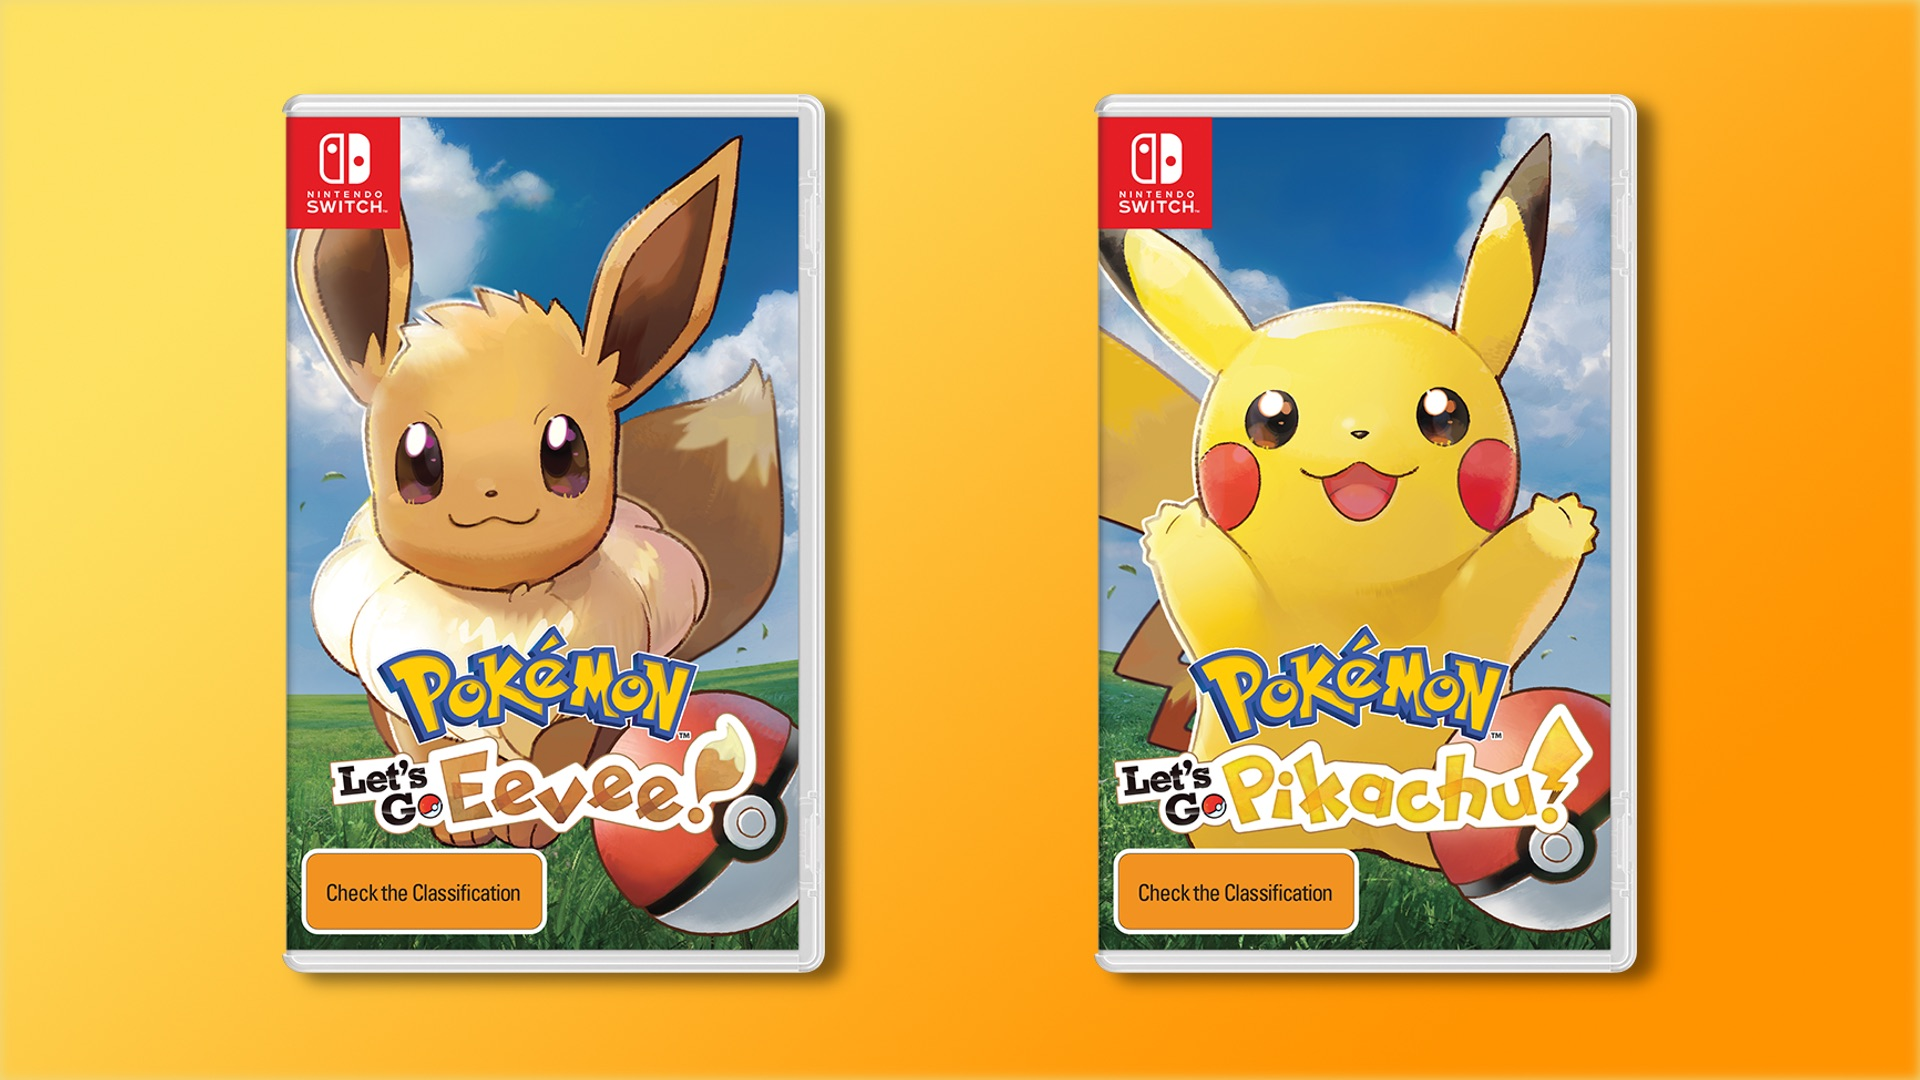 Nintendo\'s Switch is getting three new Pokémon games in 2018 | TechRadar